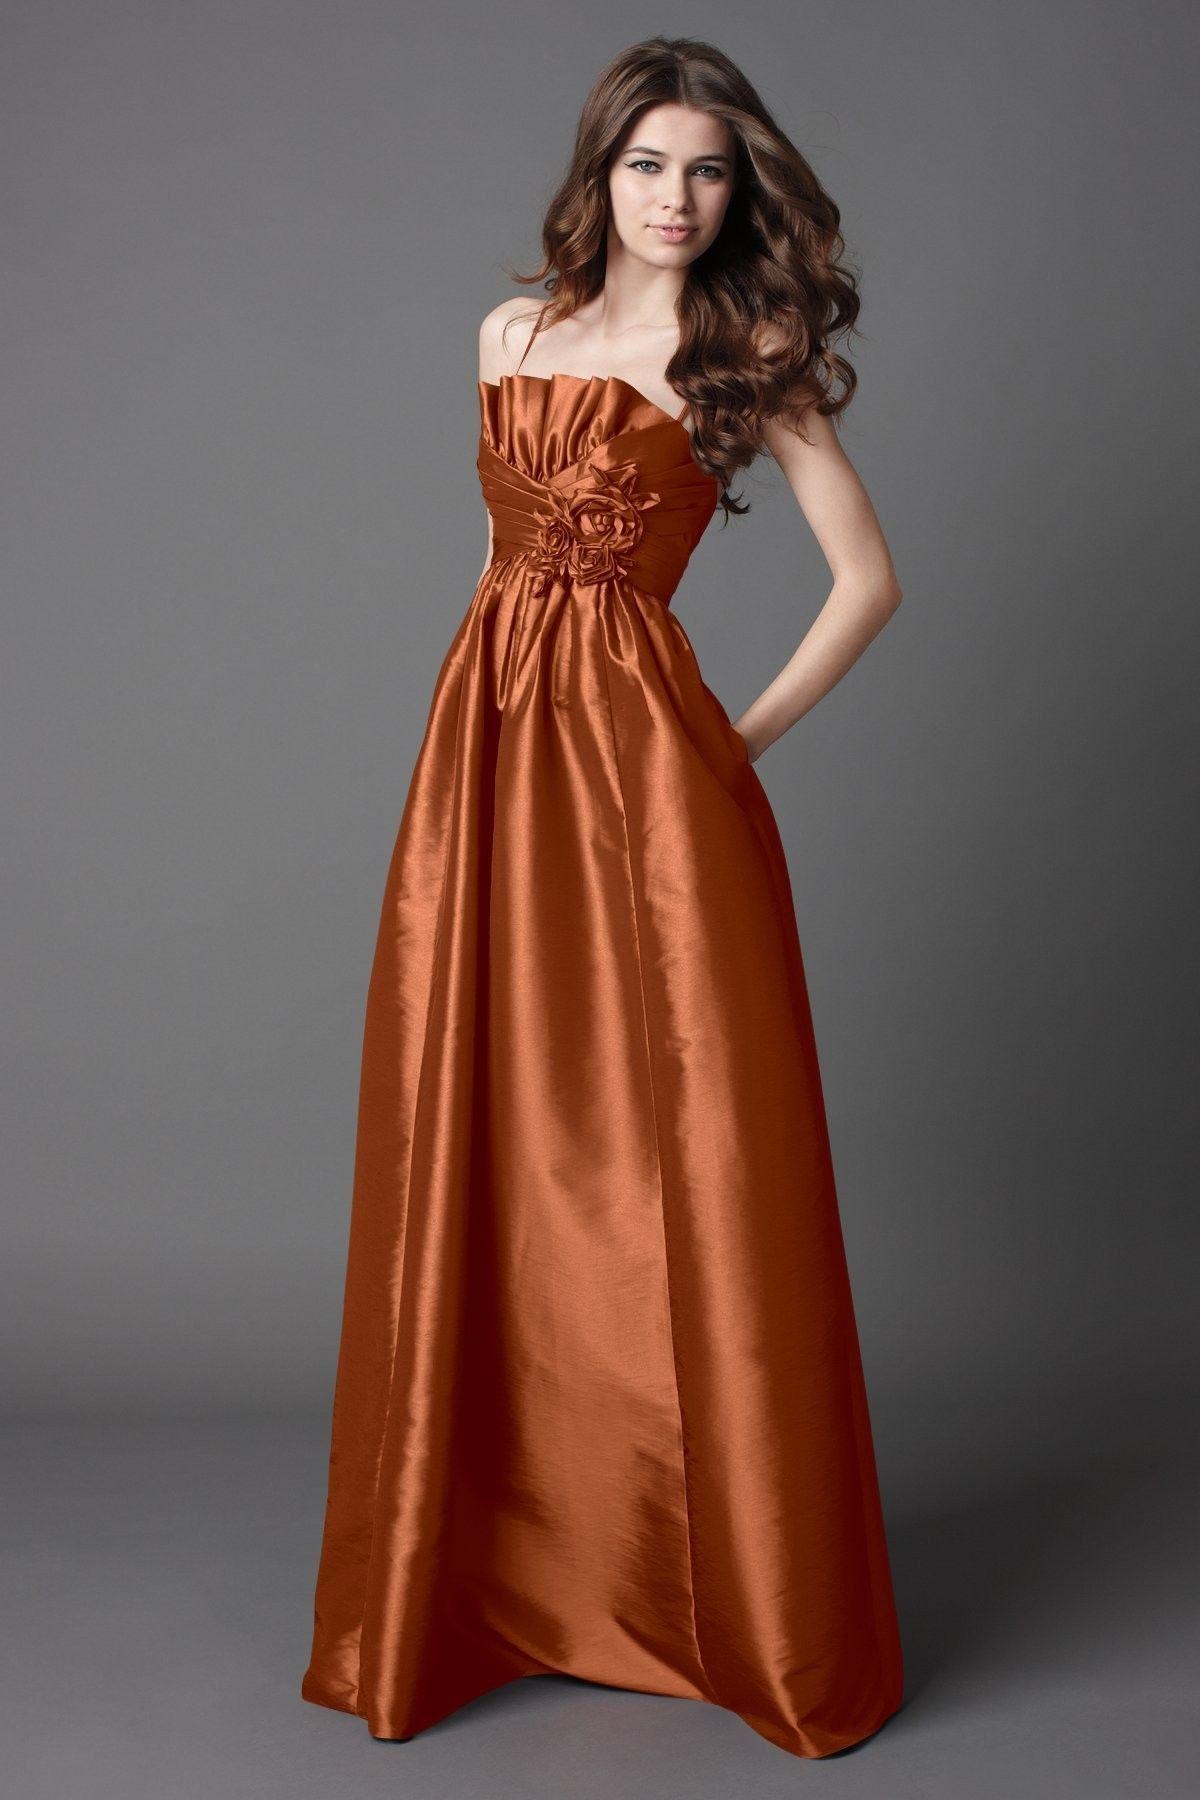 Wtoo bridesmaid dresses style 874 874 20200 wedding wtoo bridesmaid dresses style 874 874 20200 wedding dresses bridesmaid ombrellifo Gallery